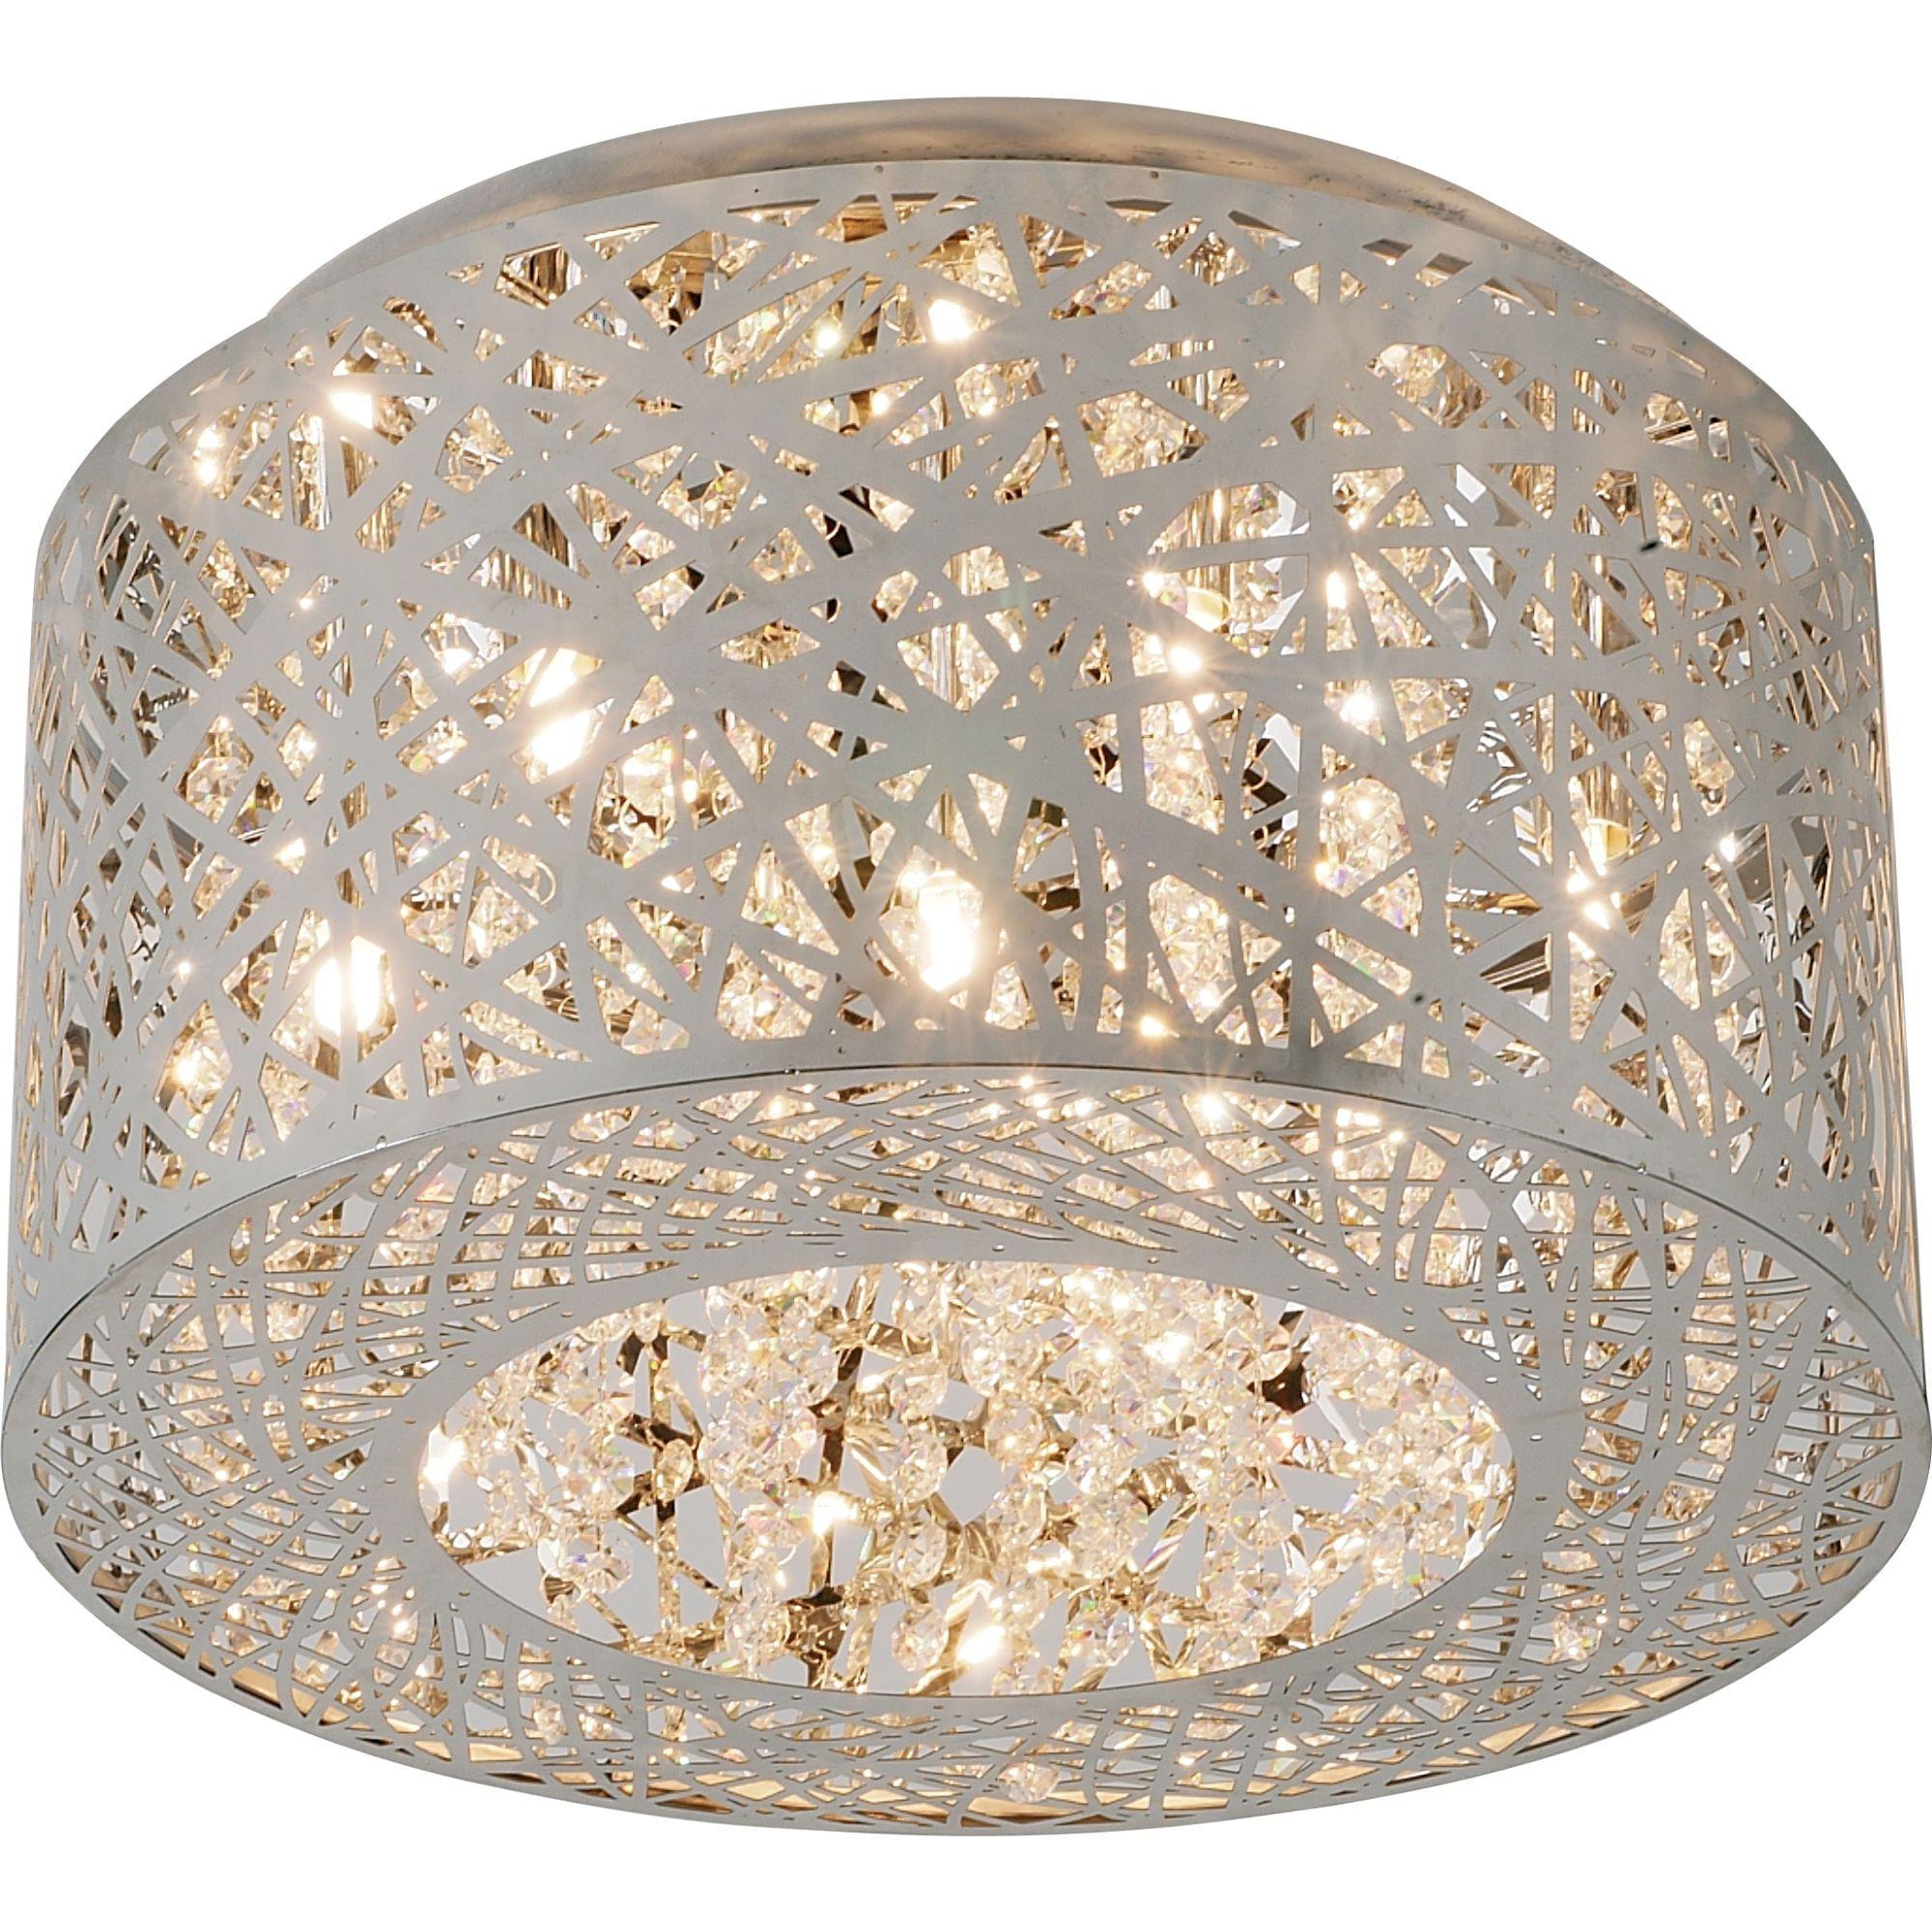 Modern Take On The Traditional Chandelier Flush Mount Ceiling Lights Flush Ceiling Lights Crystal Ceiling Light